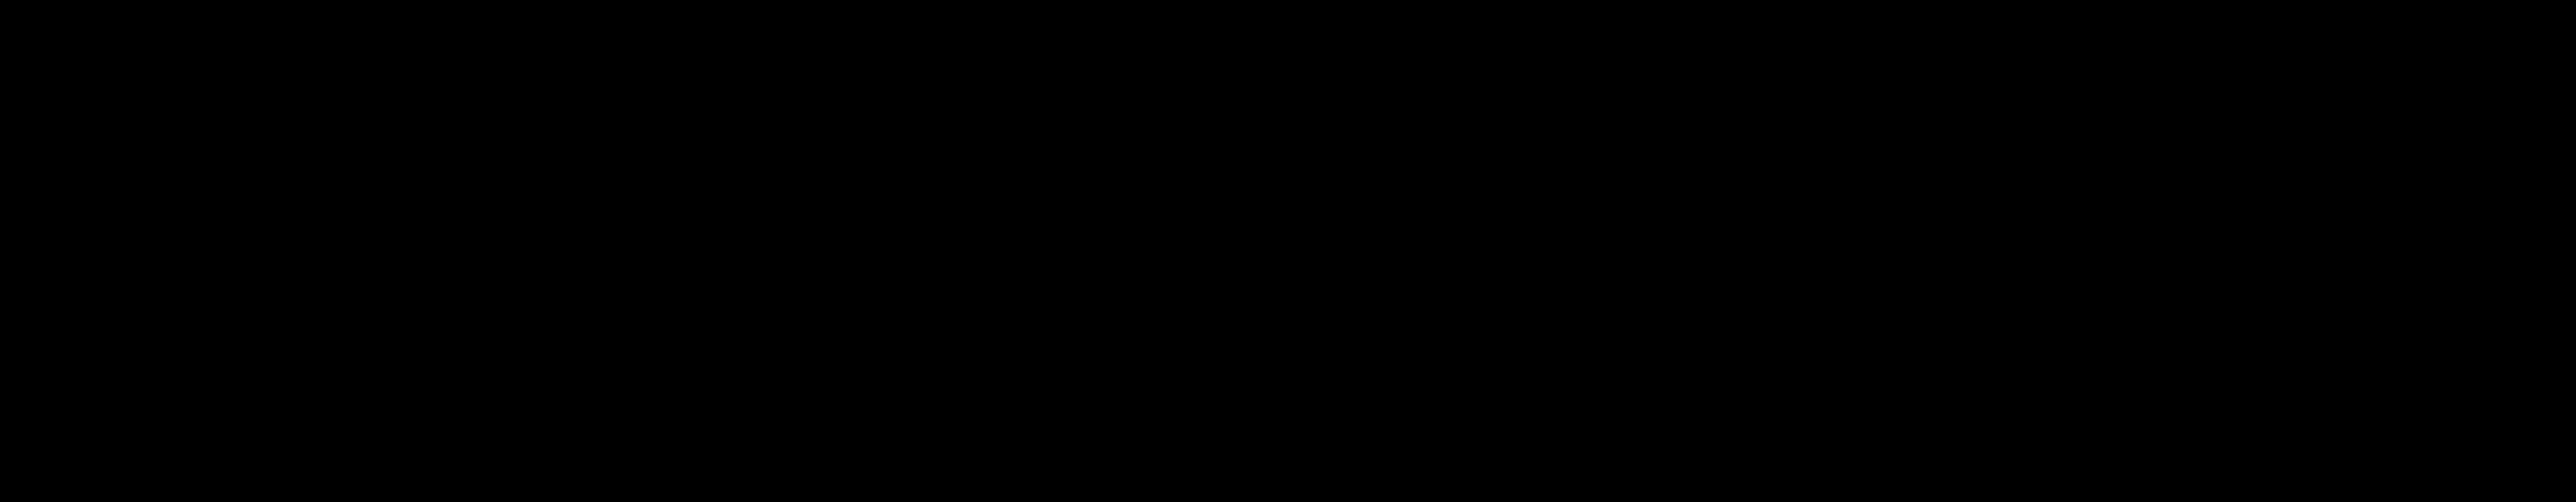 Mac Logo / Cosmetics Logonoidcom - Mac Makeup Logo Png ...